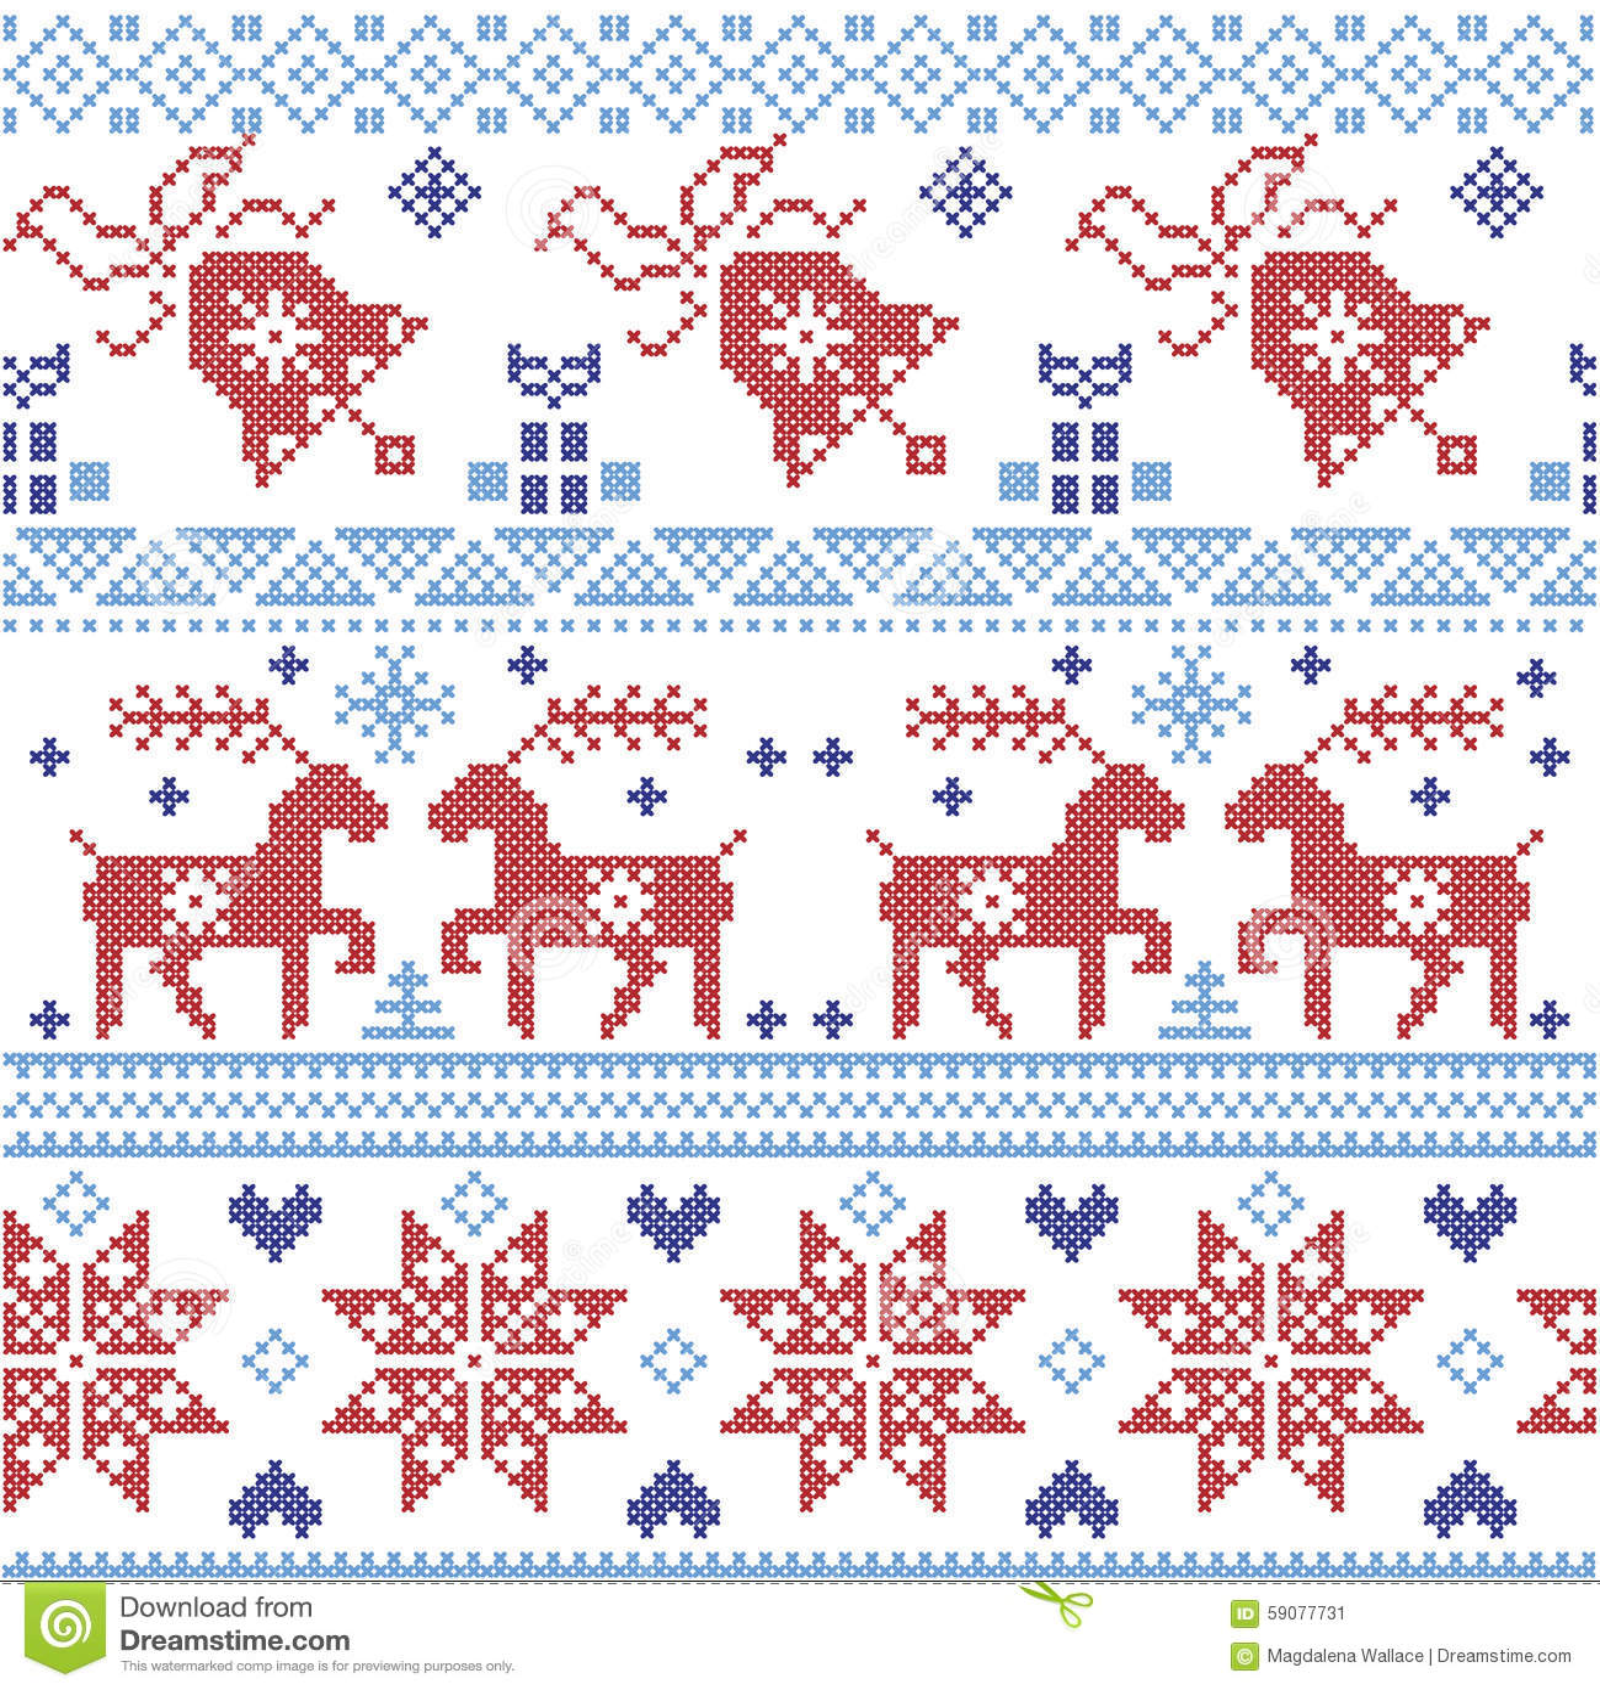 Dark And Light Blue And Red Scnadinavian Christmas Cross Stitch ...